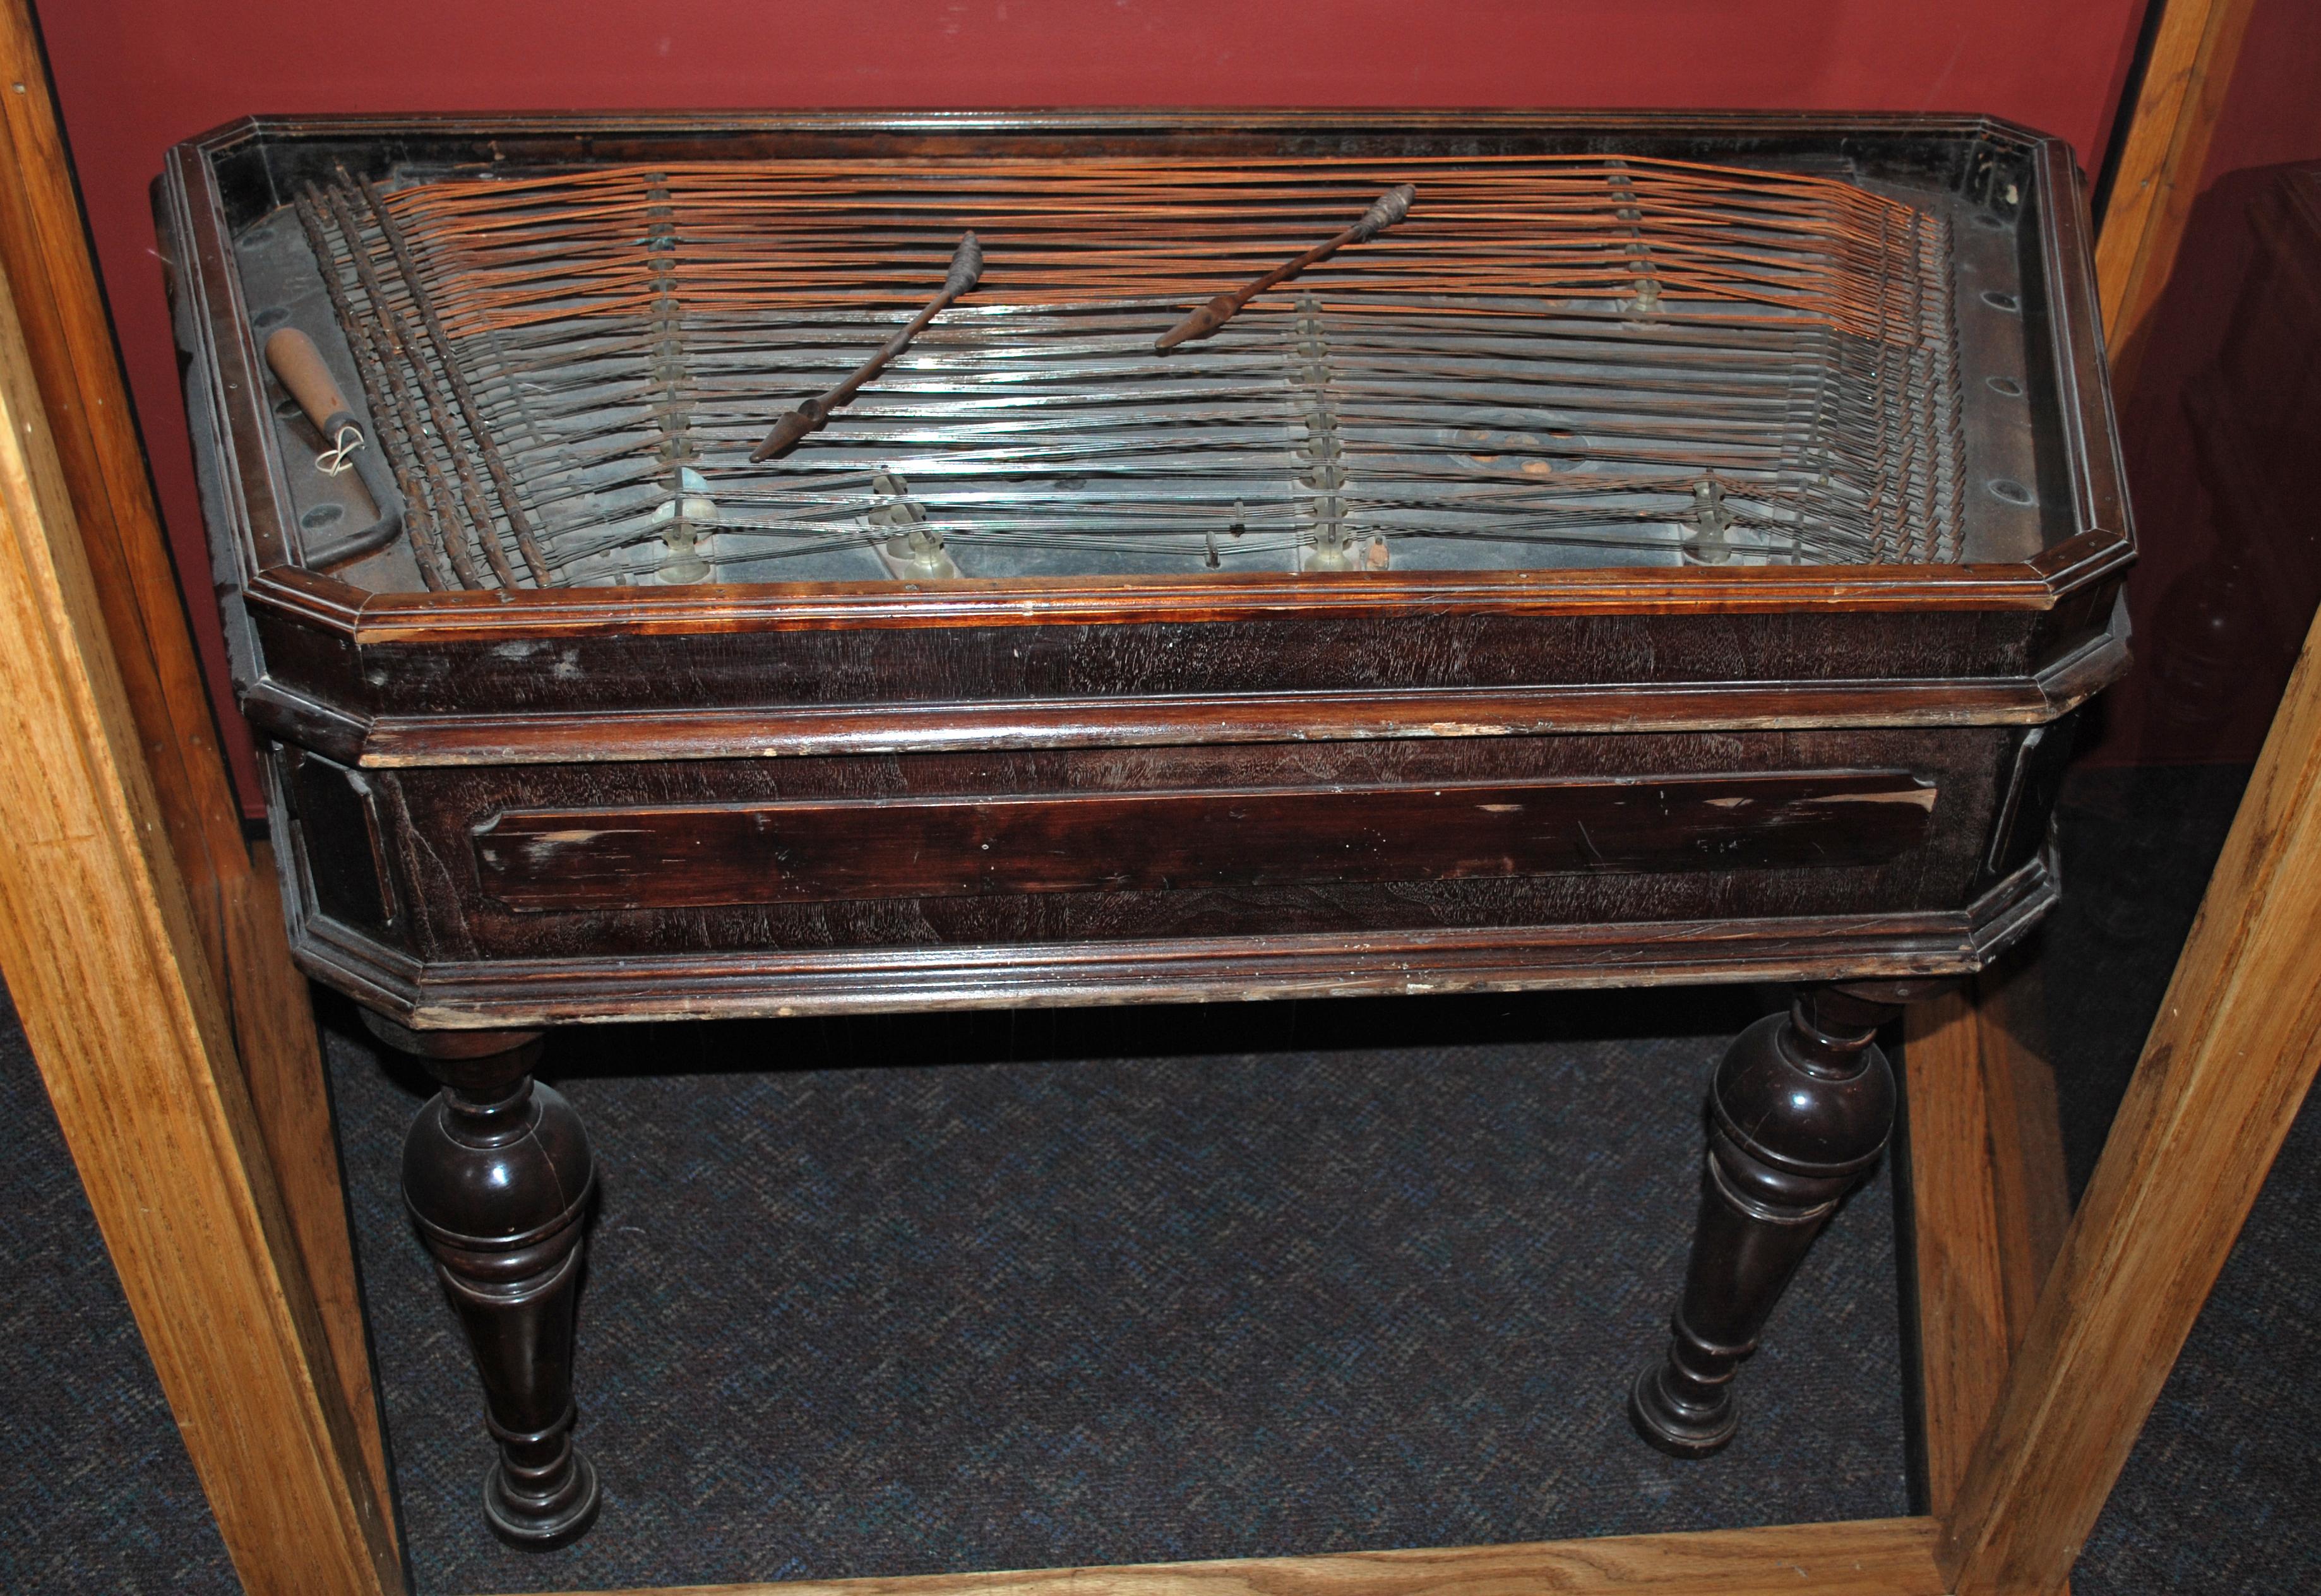 Object: Dulcimer (Cimbalom (Hungarian Dulcimer)) | UTSA Institute Of Texan Cultures